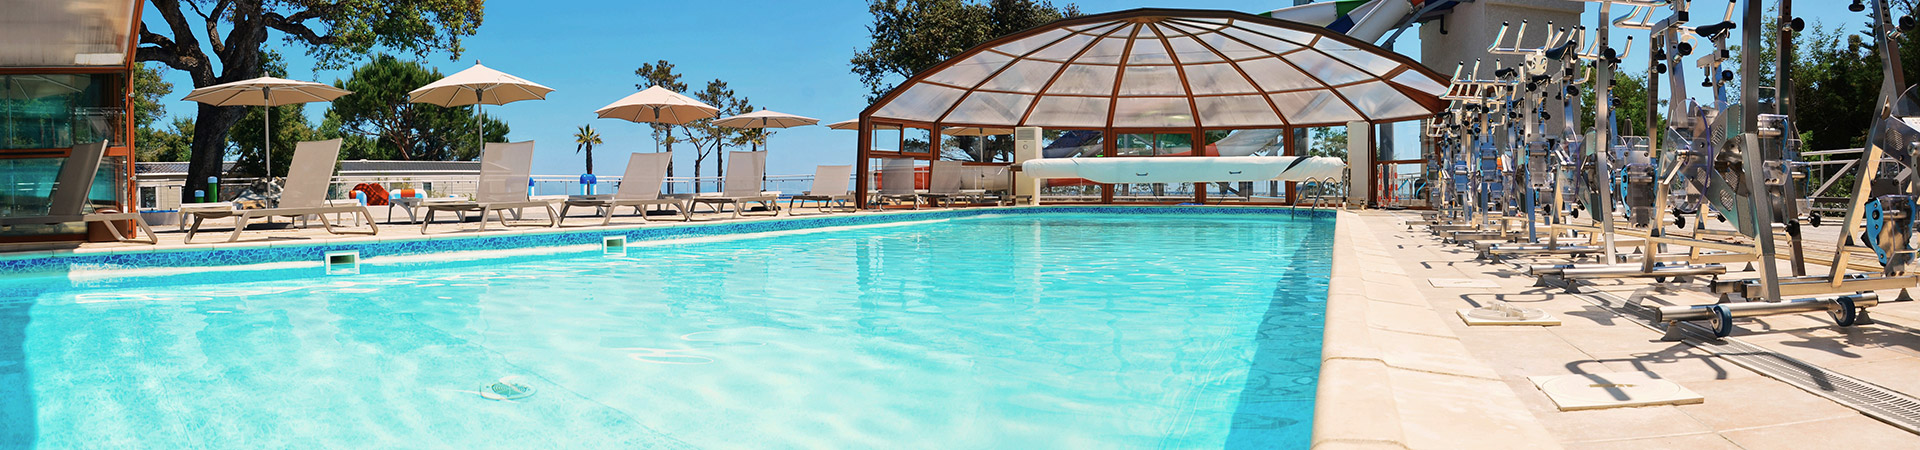 service-piscine-chauffee-camping-merendella